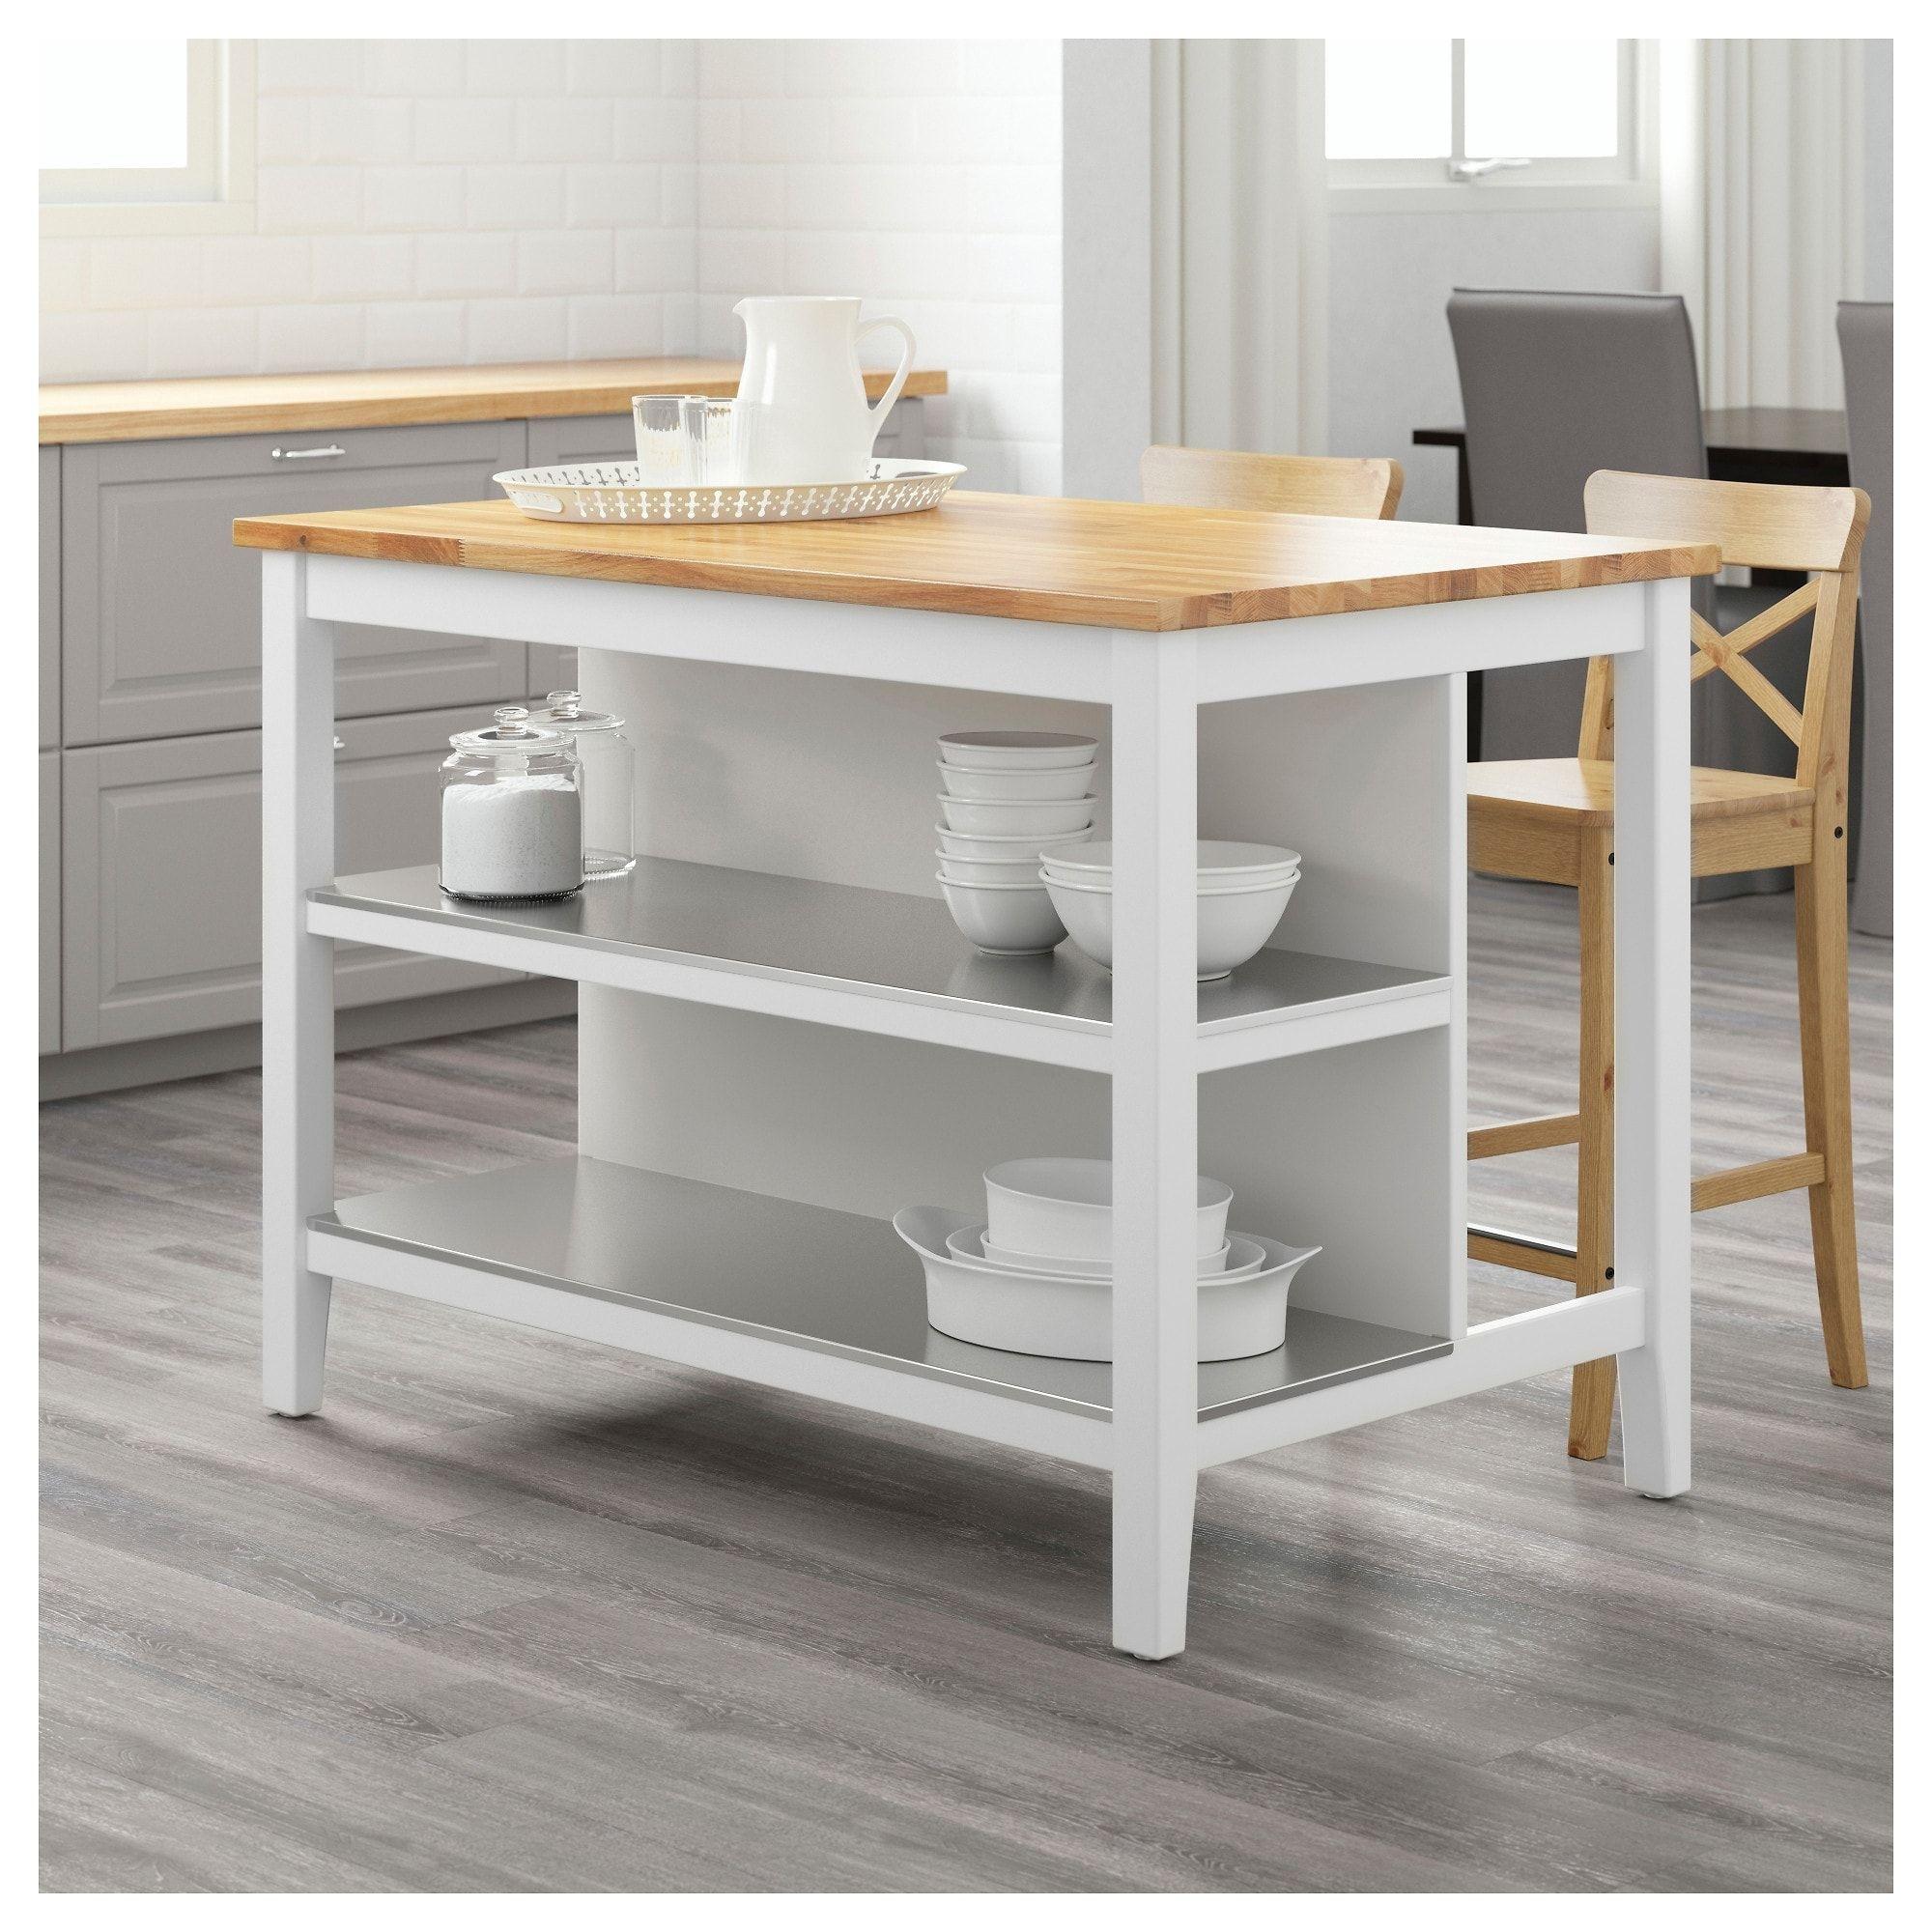 Ikea Kitchen Islands You Ll Love In 2020 Visualhunt